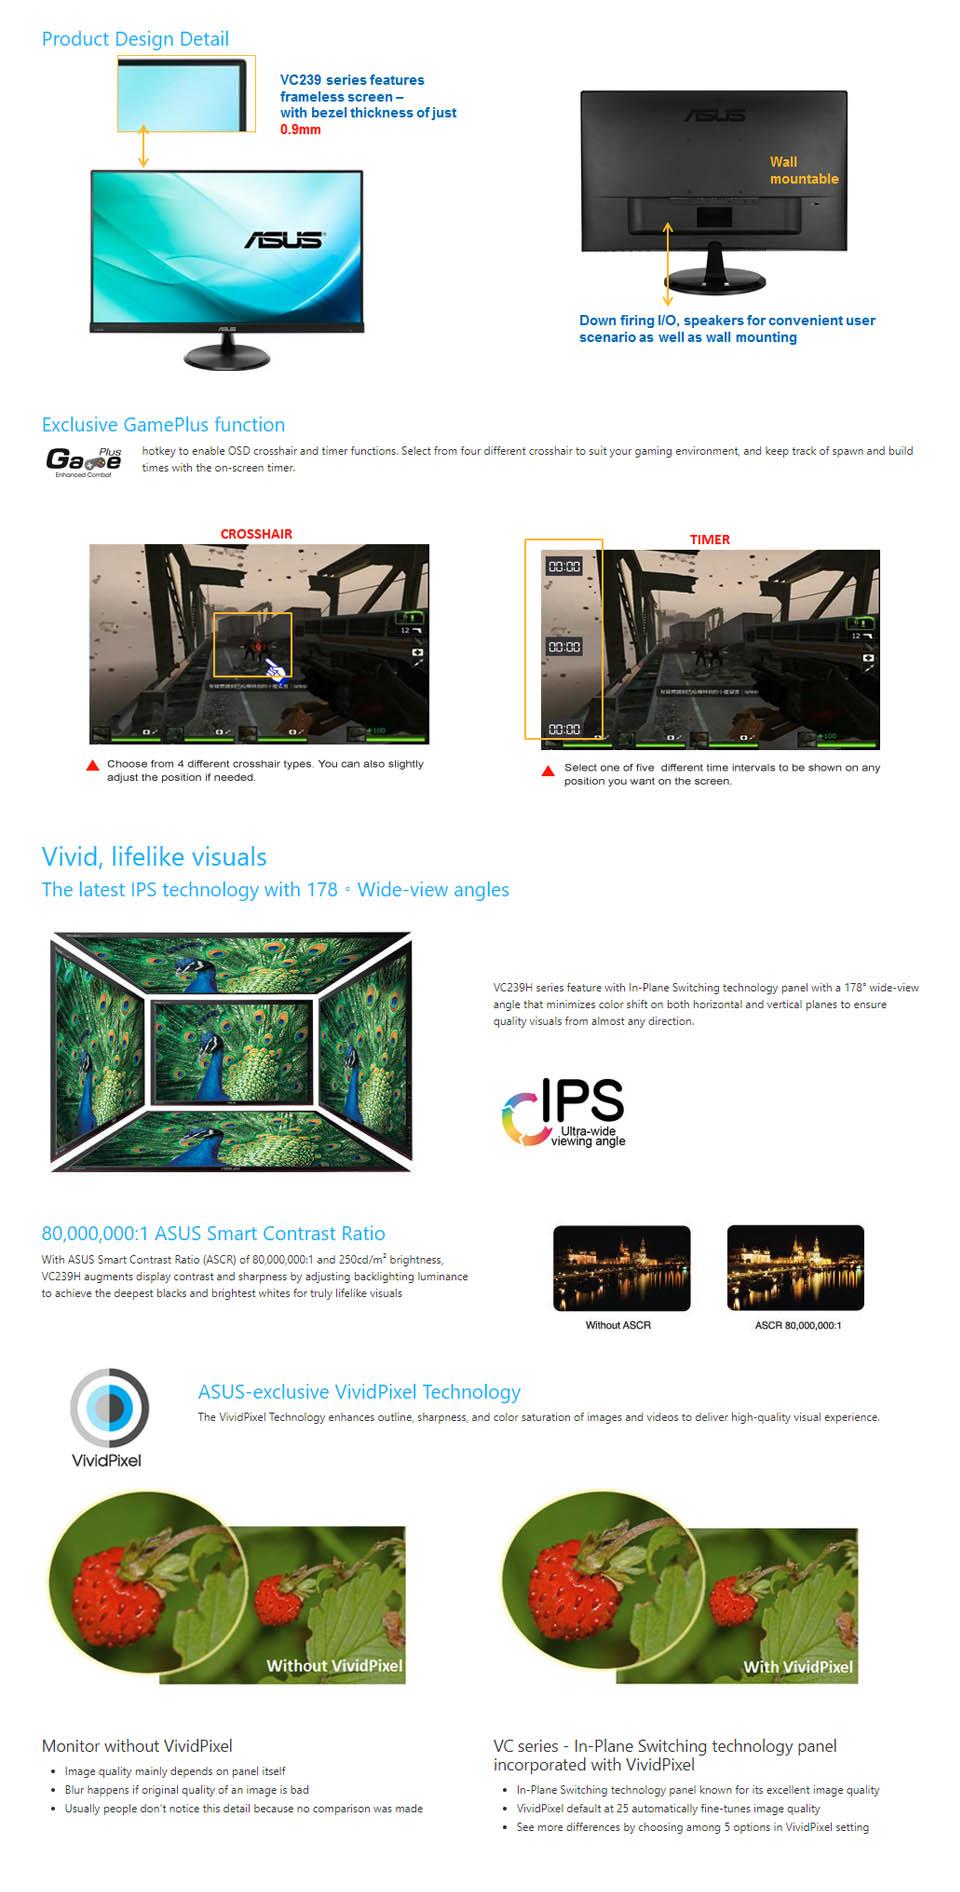 Buy Asus 23 Ips 1080p Vc239h Online Australia Monitor Eye Care Frameless Full Hd Speaker Tuv Gtg Response Time Flicker Free Technlogy Low Blue Light Modes Speakers Vesa 100mm Support Exclusive Gameplus And Hdmi